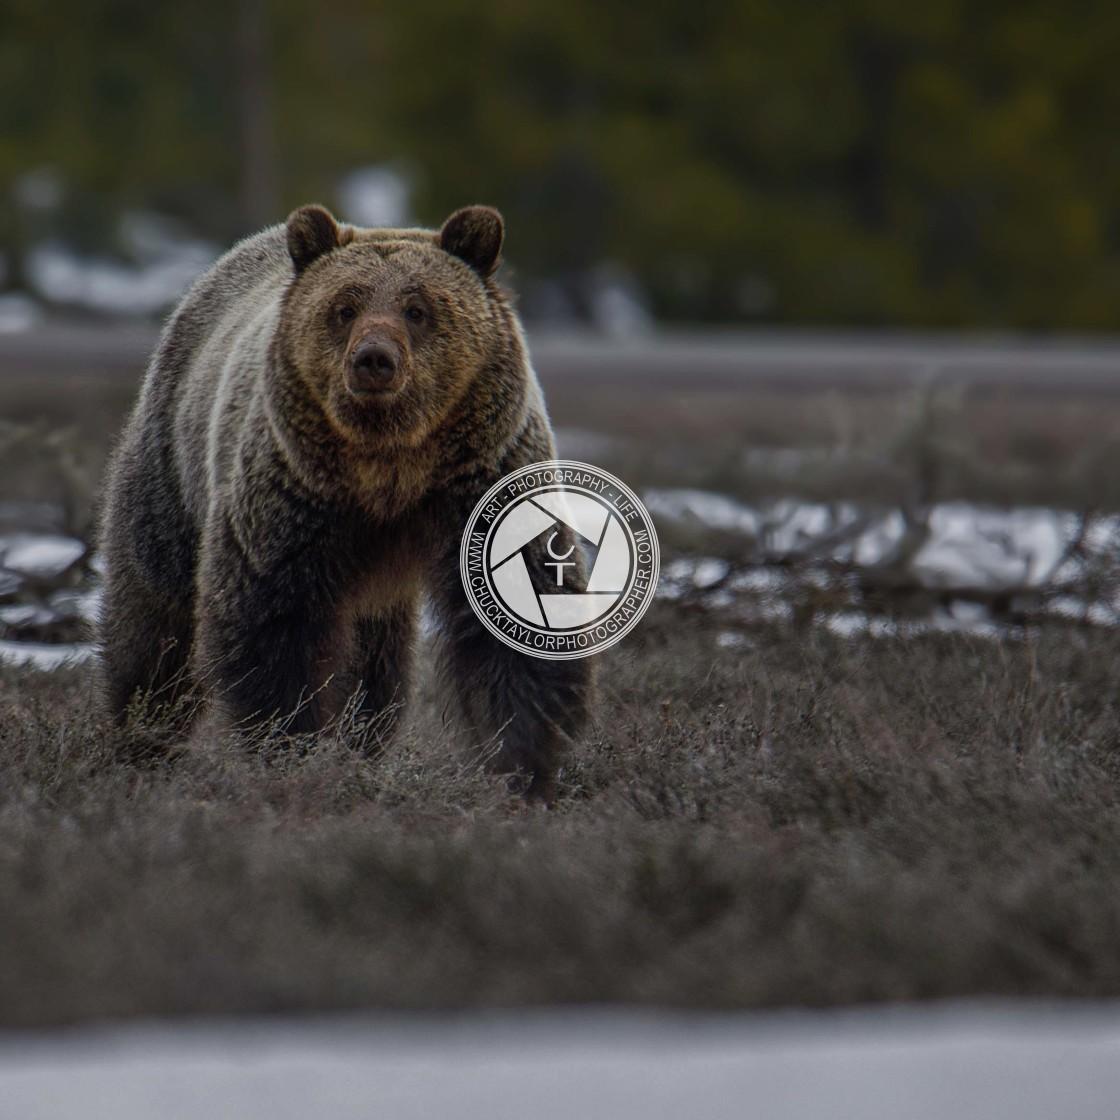 """bear-grizzly-wild-grand teton national park"" stock image"